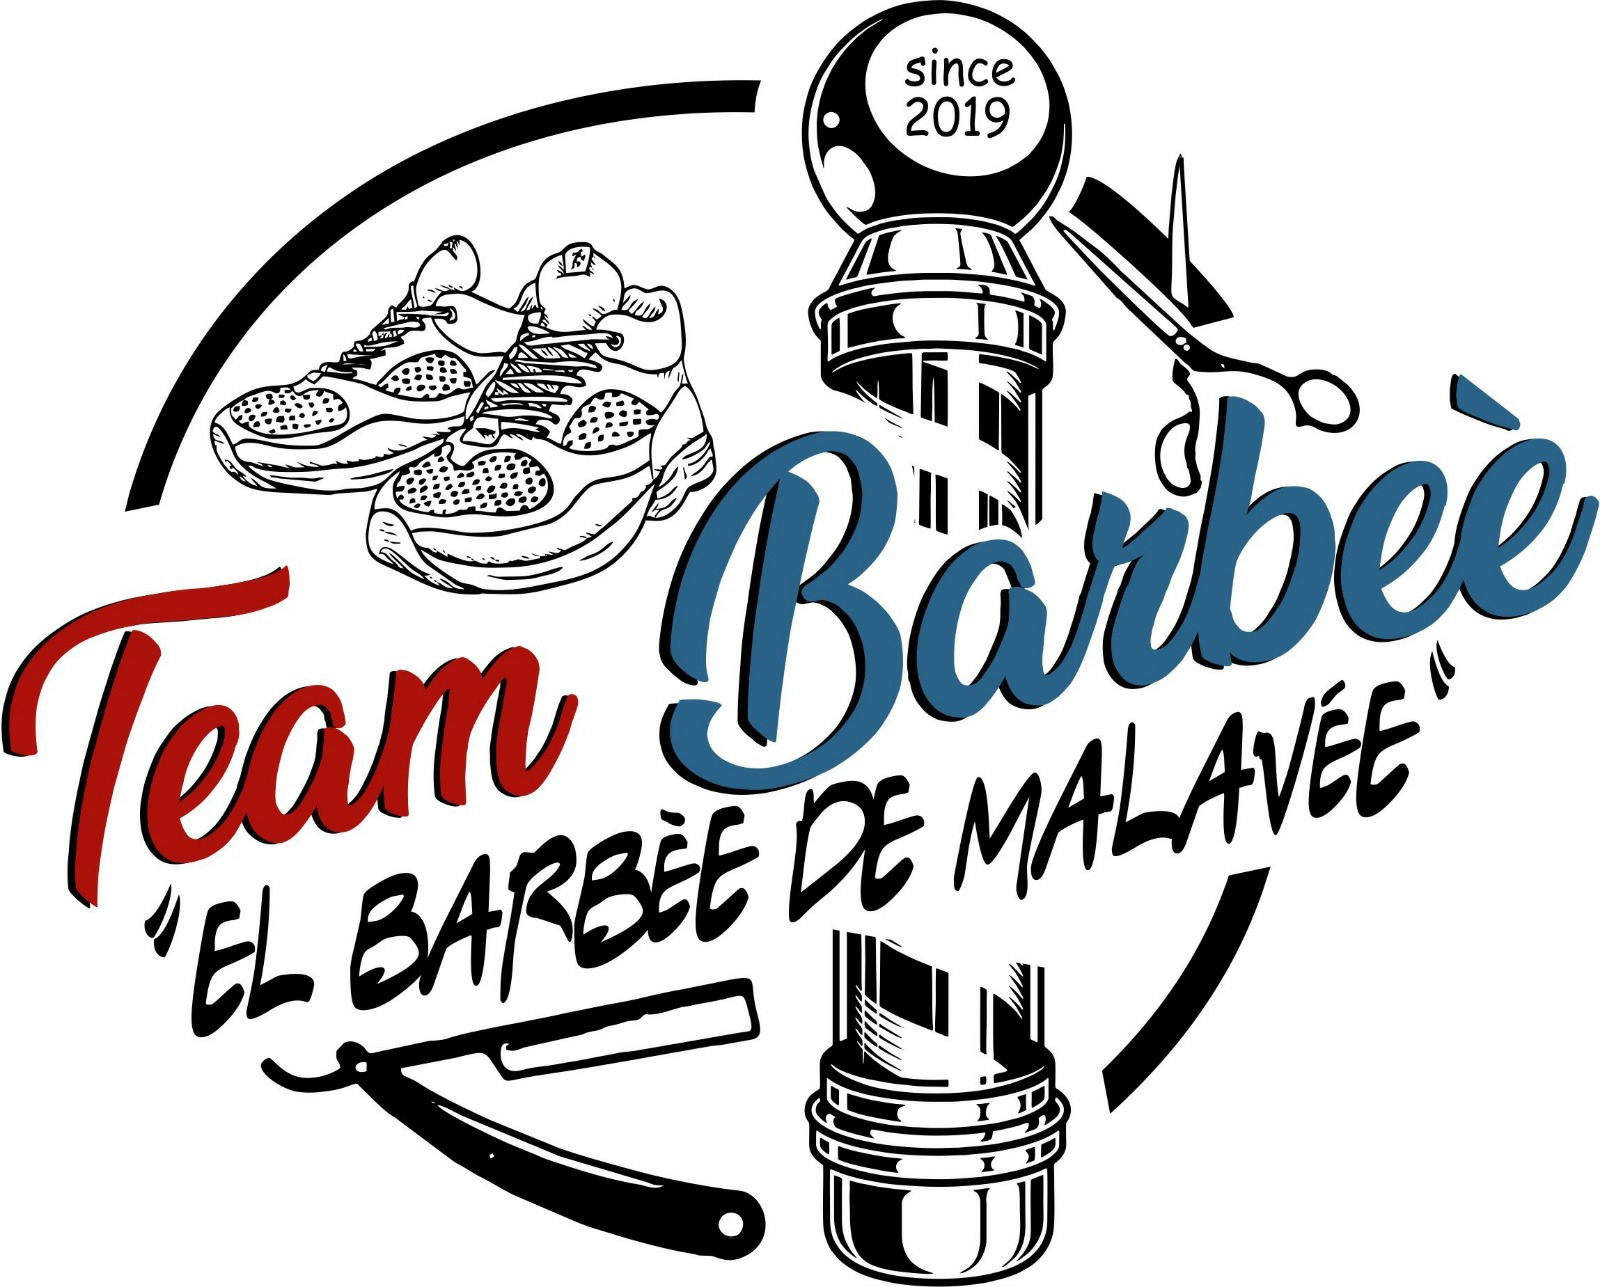 team barbee